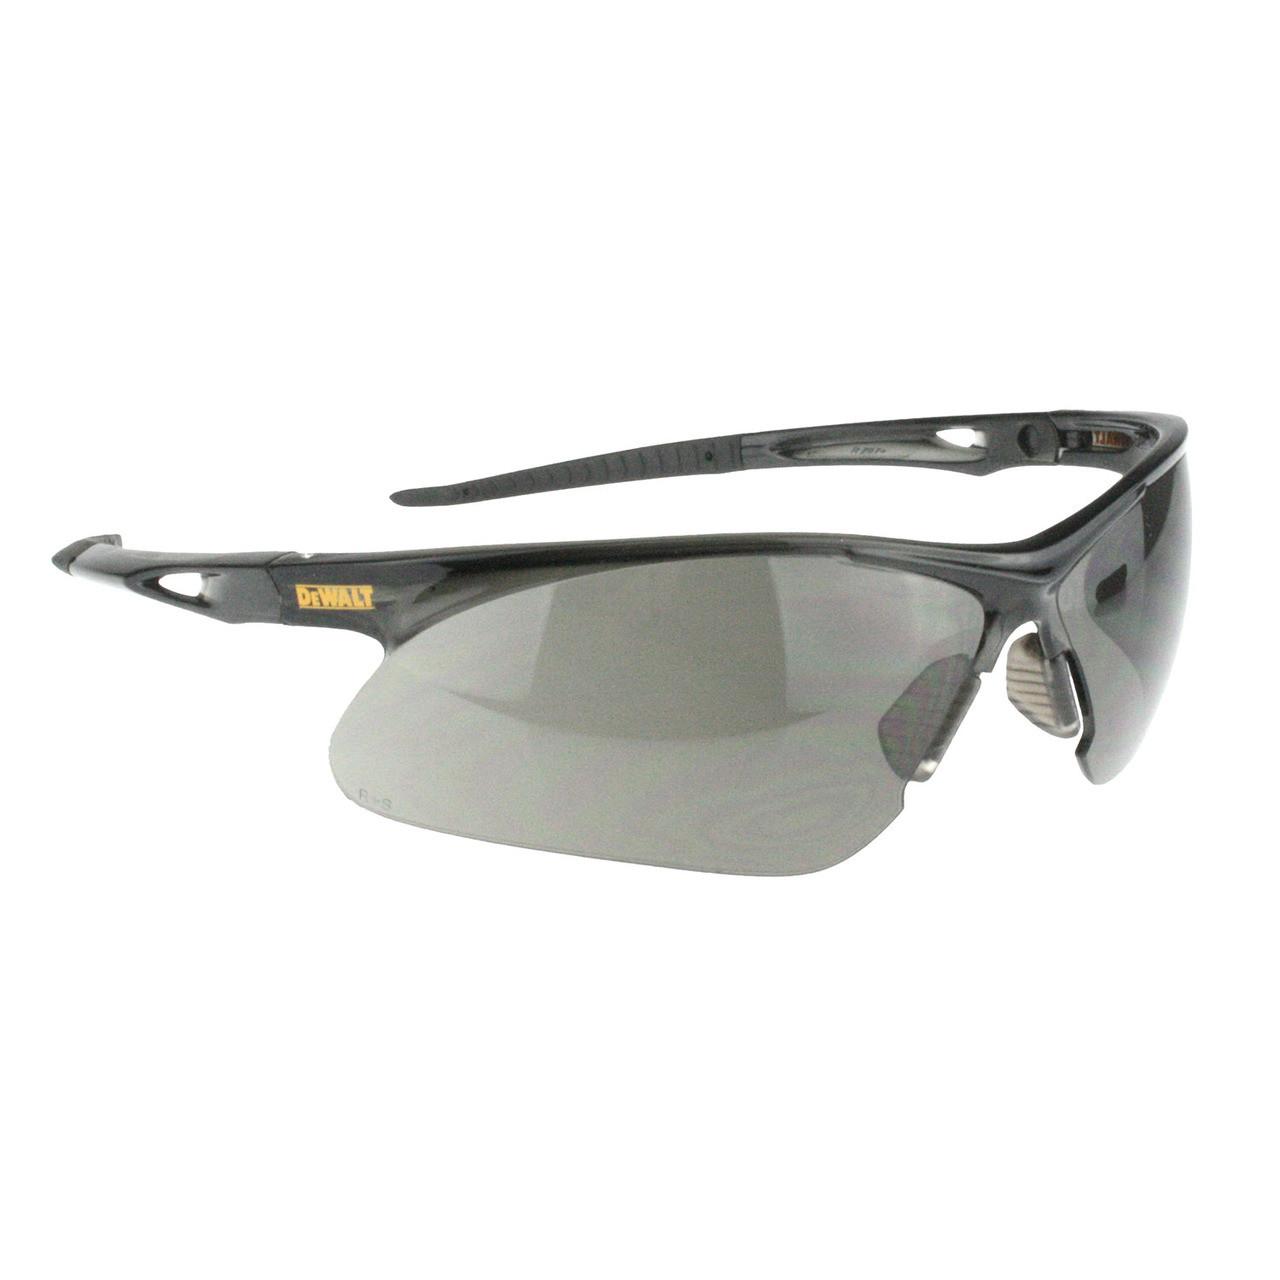 6dd5acf8001 Dewalt DPG102-2D Recip Safety Glasses - Smoke Lens. Price   5.50. Image 1